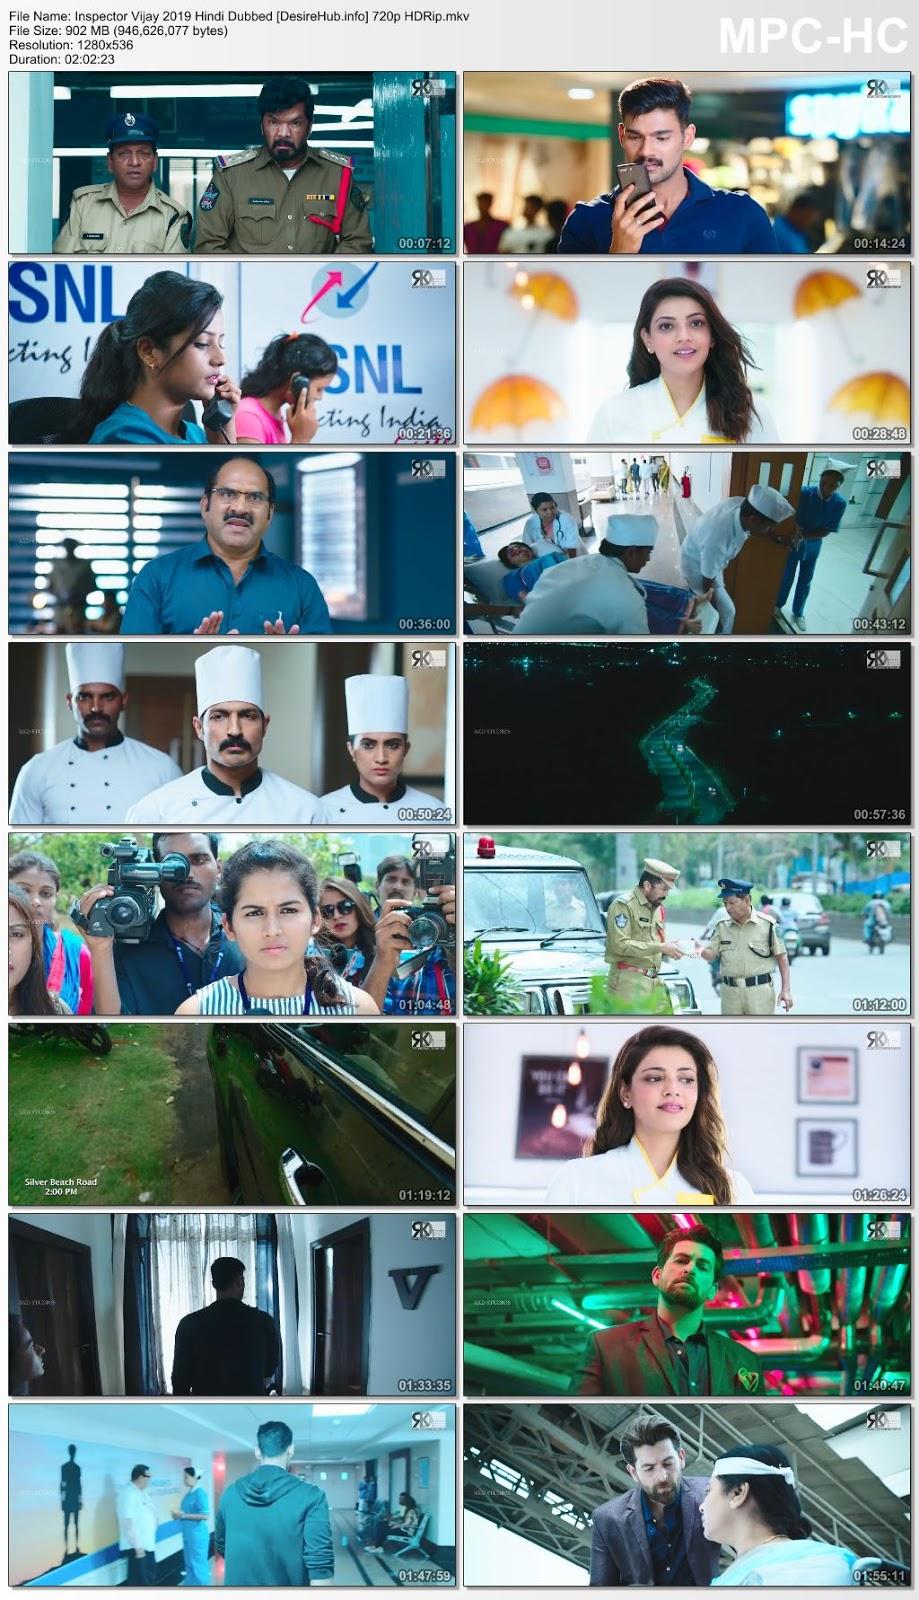 Inspector Vijay 2019 Hindi Dubbed 720p HDRip 900MB Desirehub